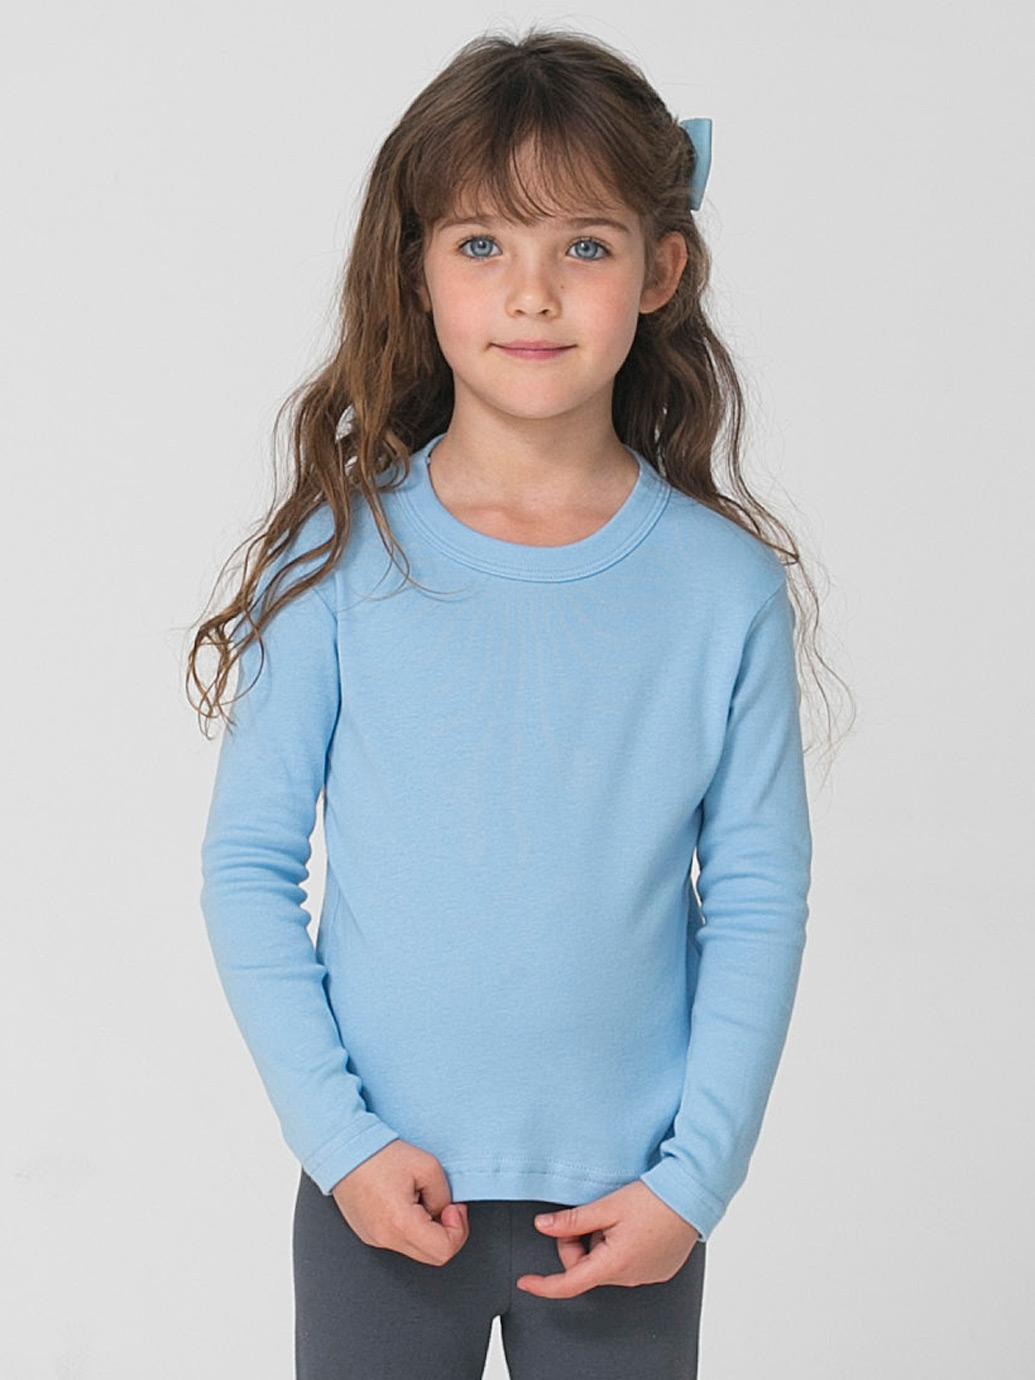 Baby Blue Womens Shirt